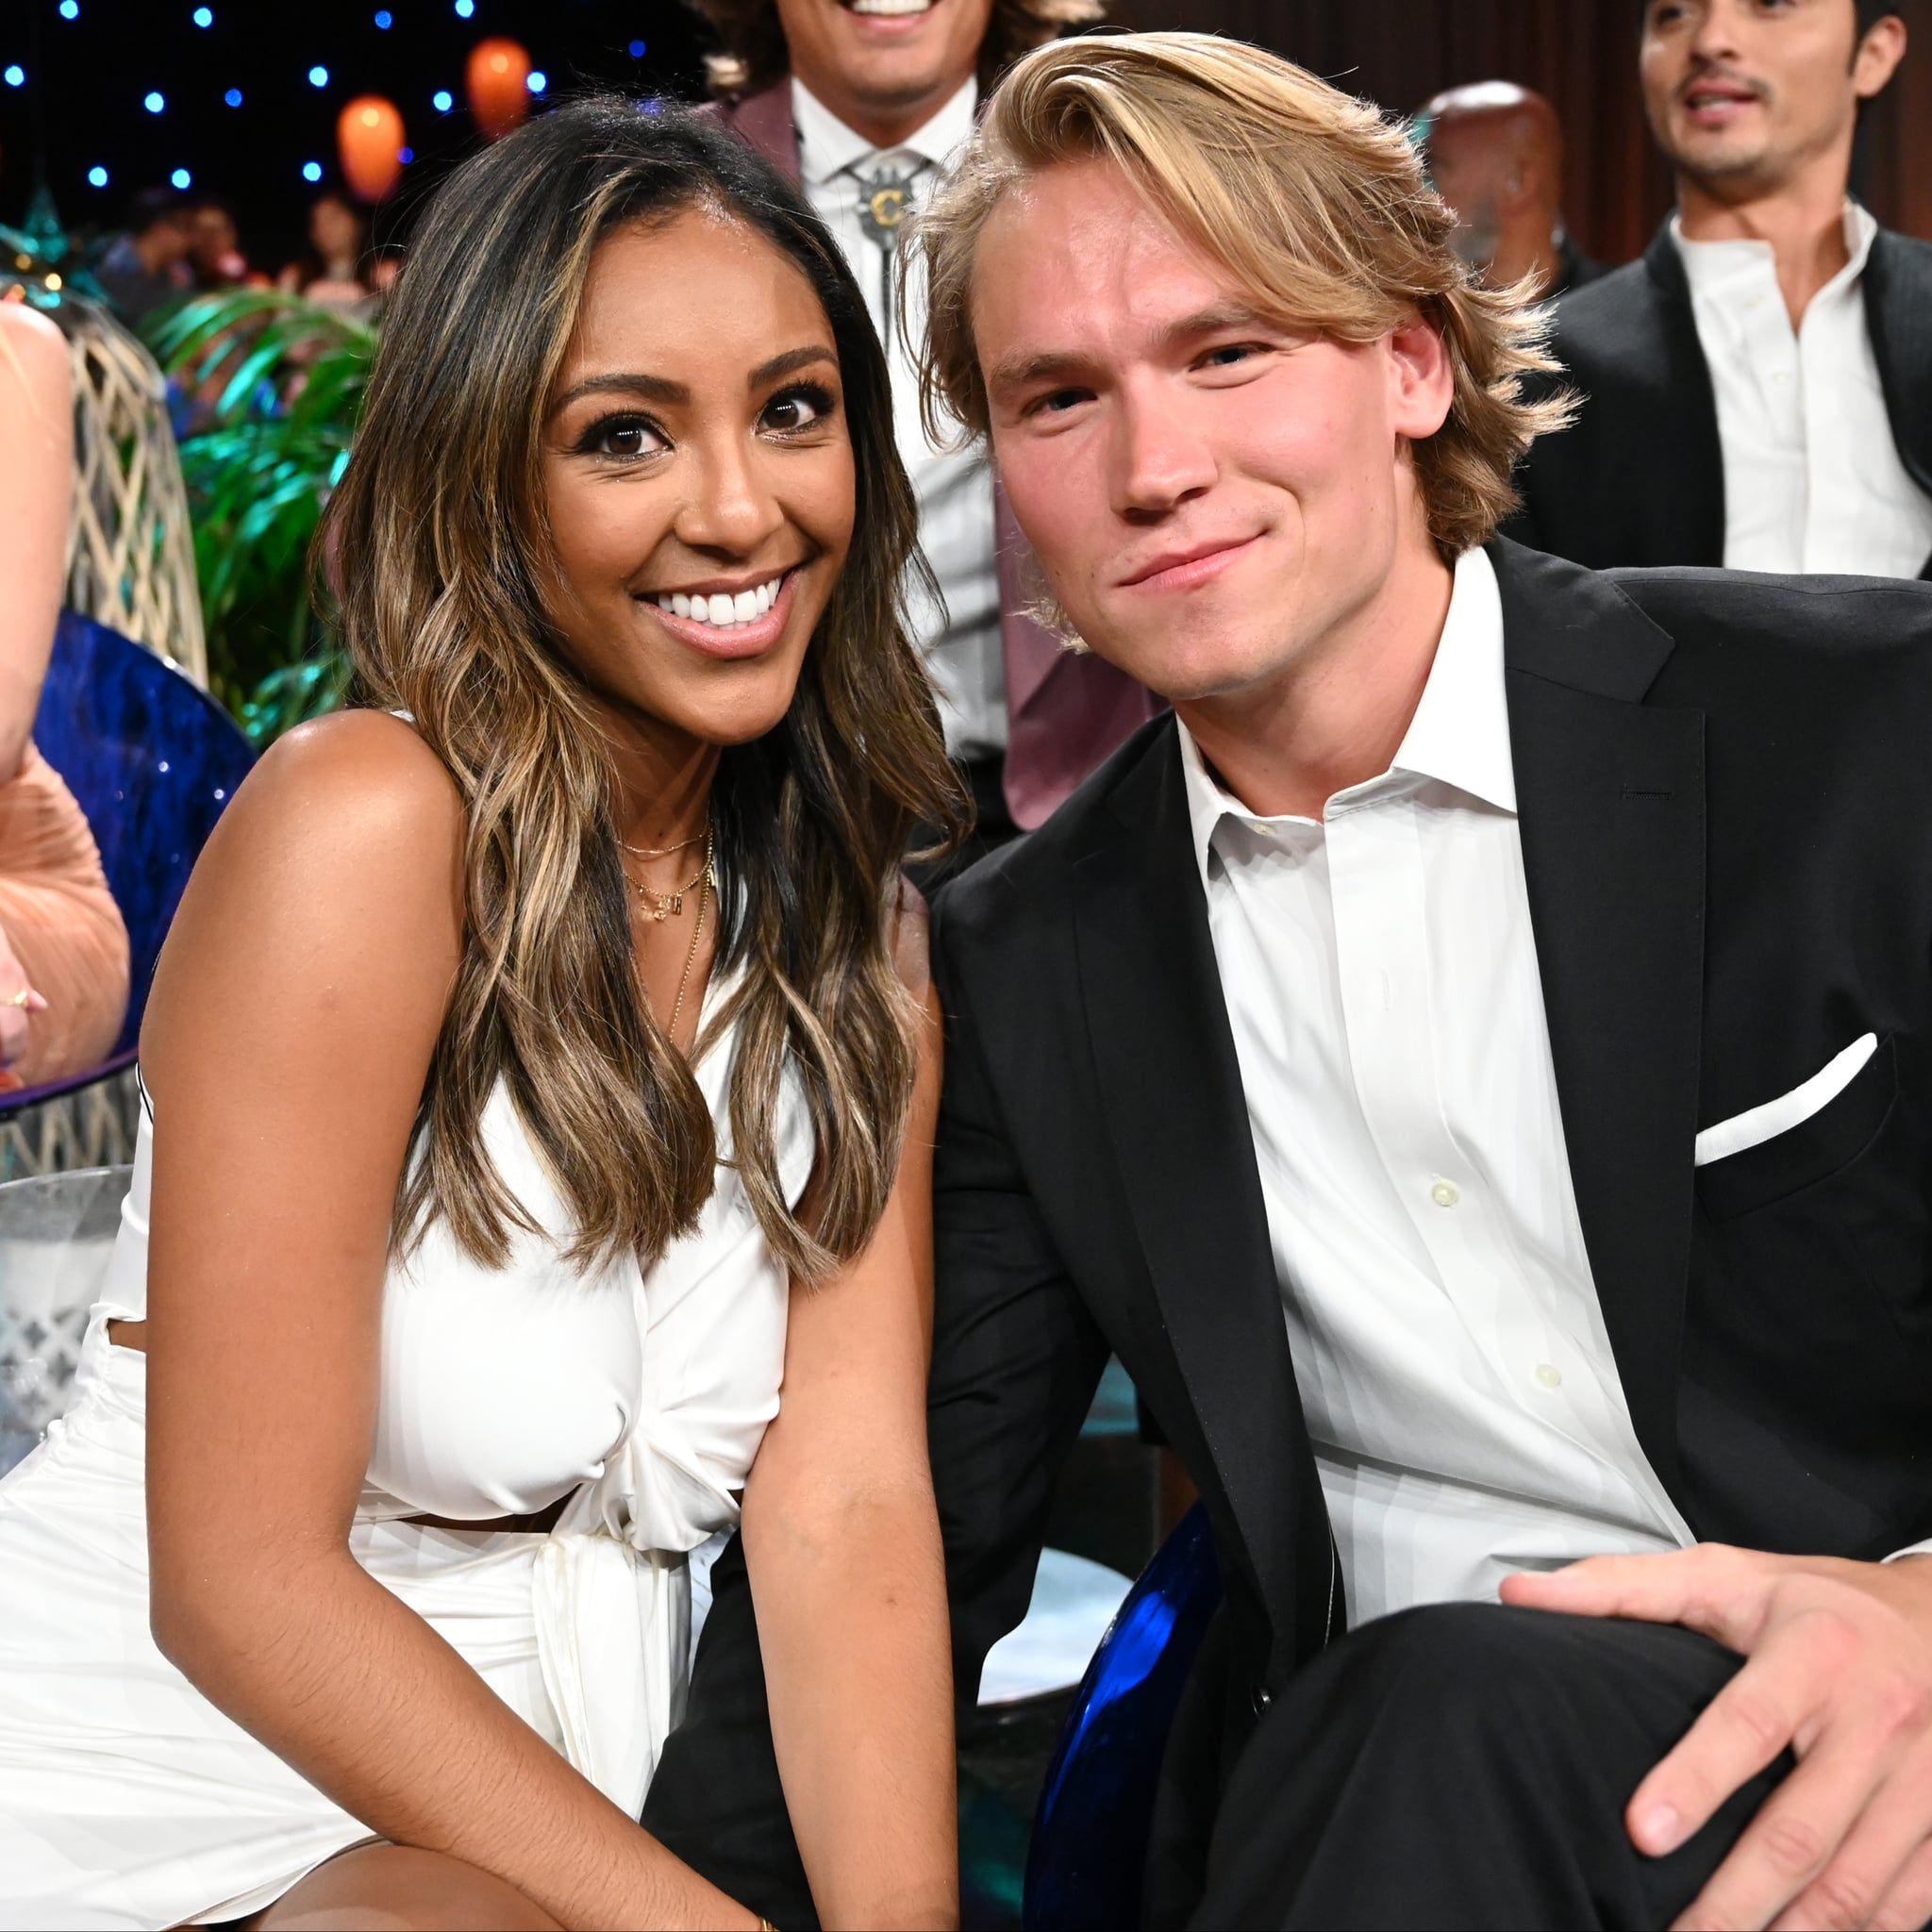 John Paul Jones And Tayshia S Bip Reunion Has Bachelor Nation Praising Her Bold Move John Paul Jones Bachelor Nation Celebrity Couples